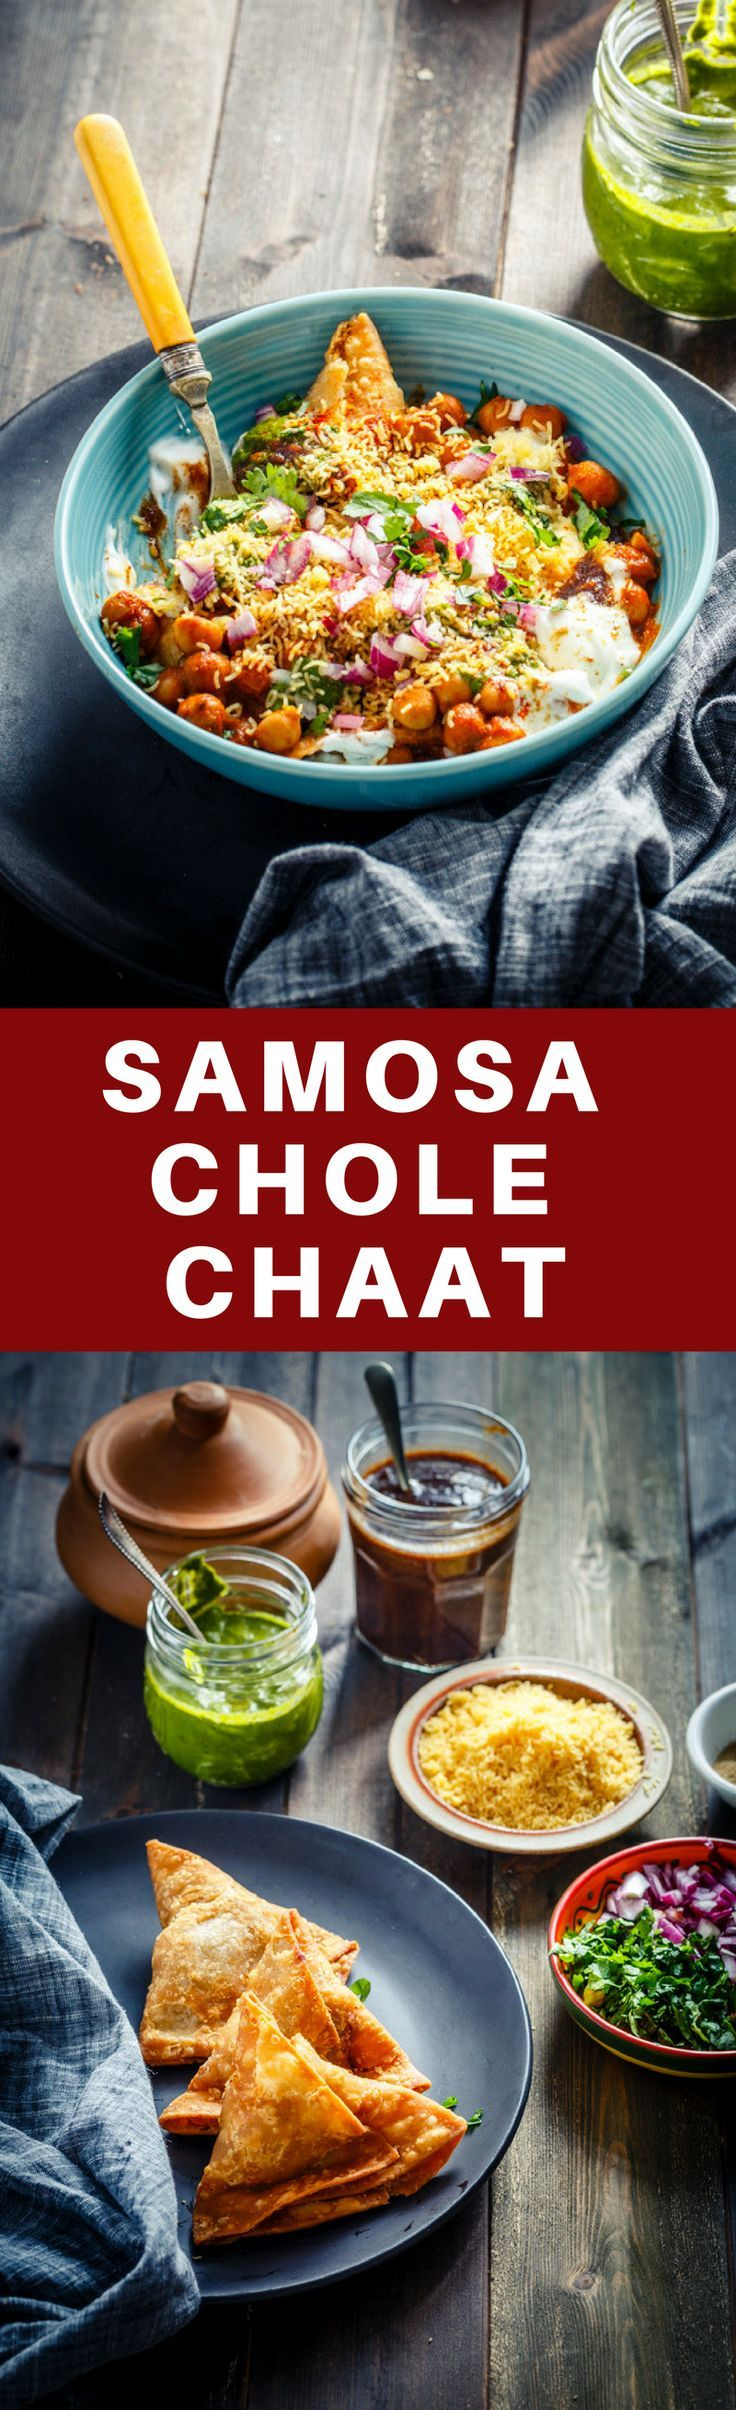 Samosa Chaat #streetfood #indianstreetfood #samosa #chaat